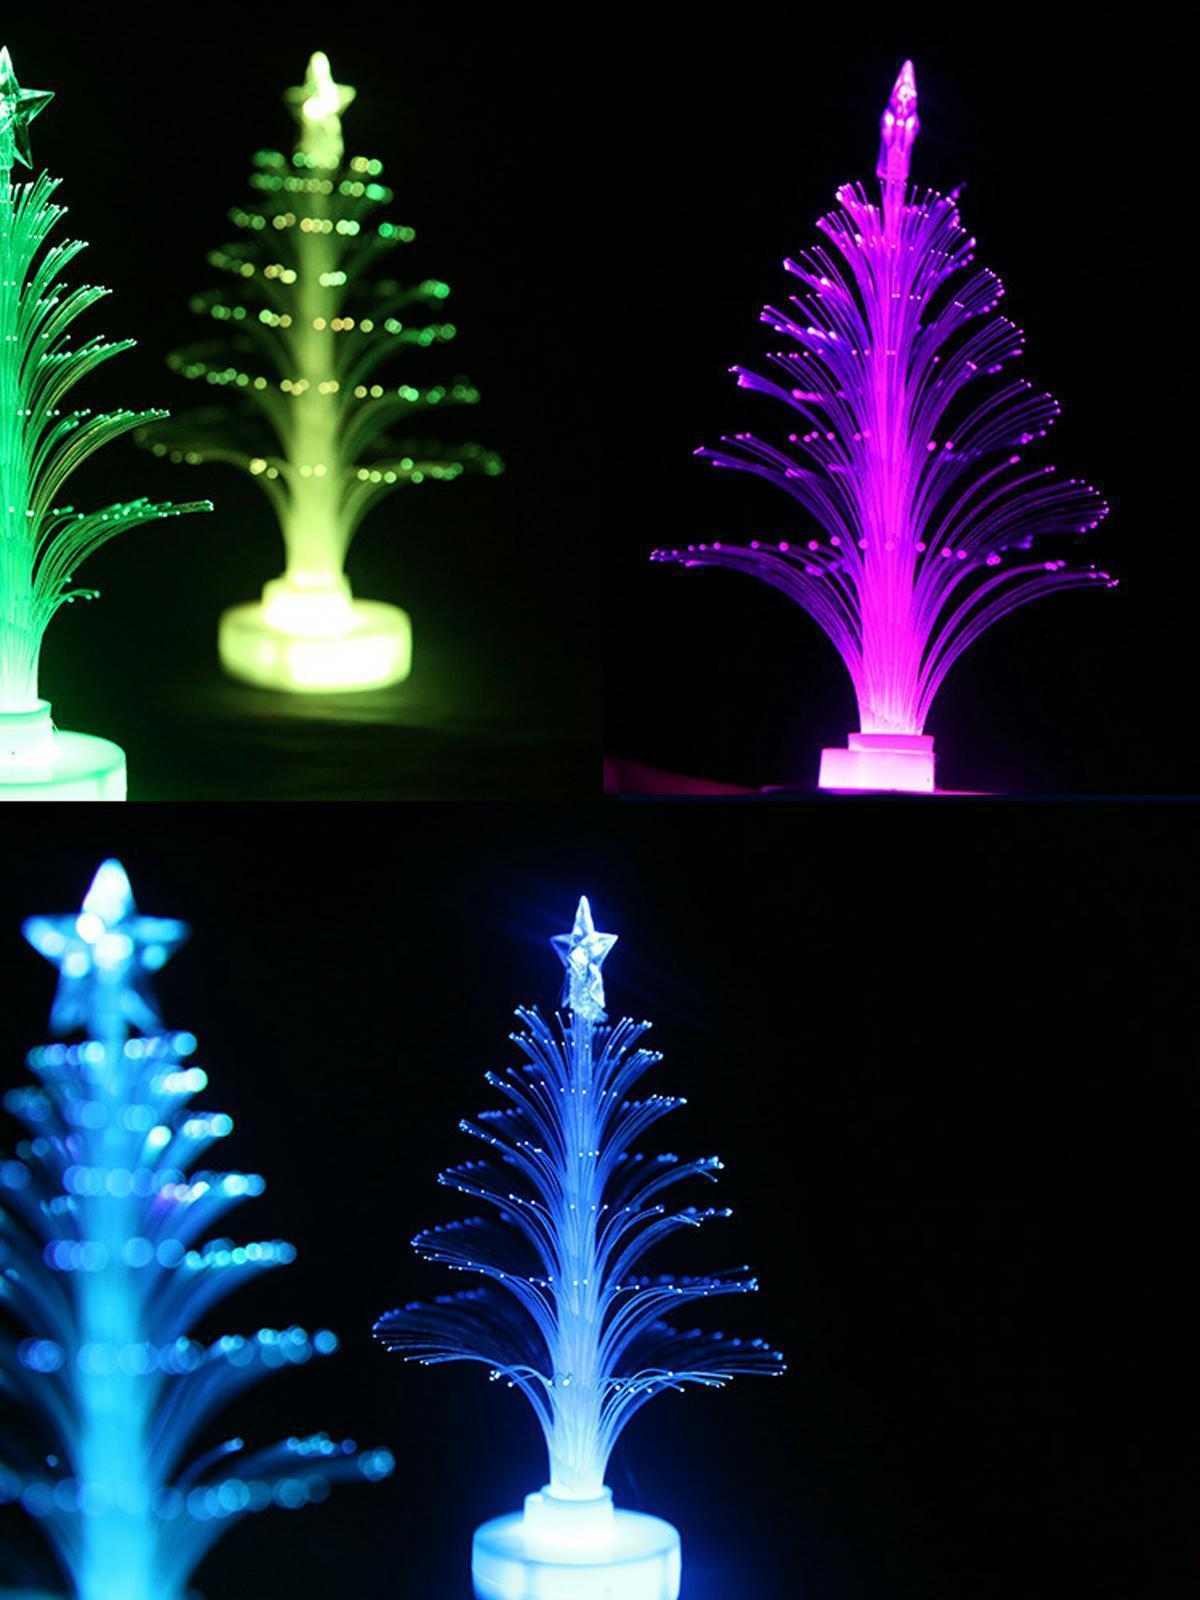 Christmas Fiber Led Optic Light Lamp Changing Color Xmas Tree Decor Ornament New